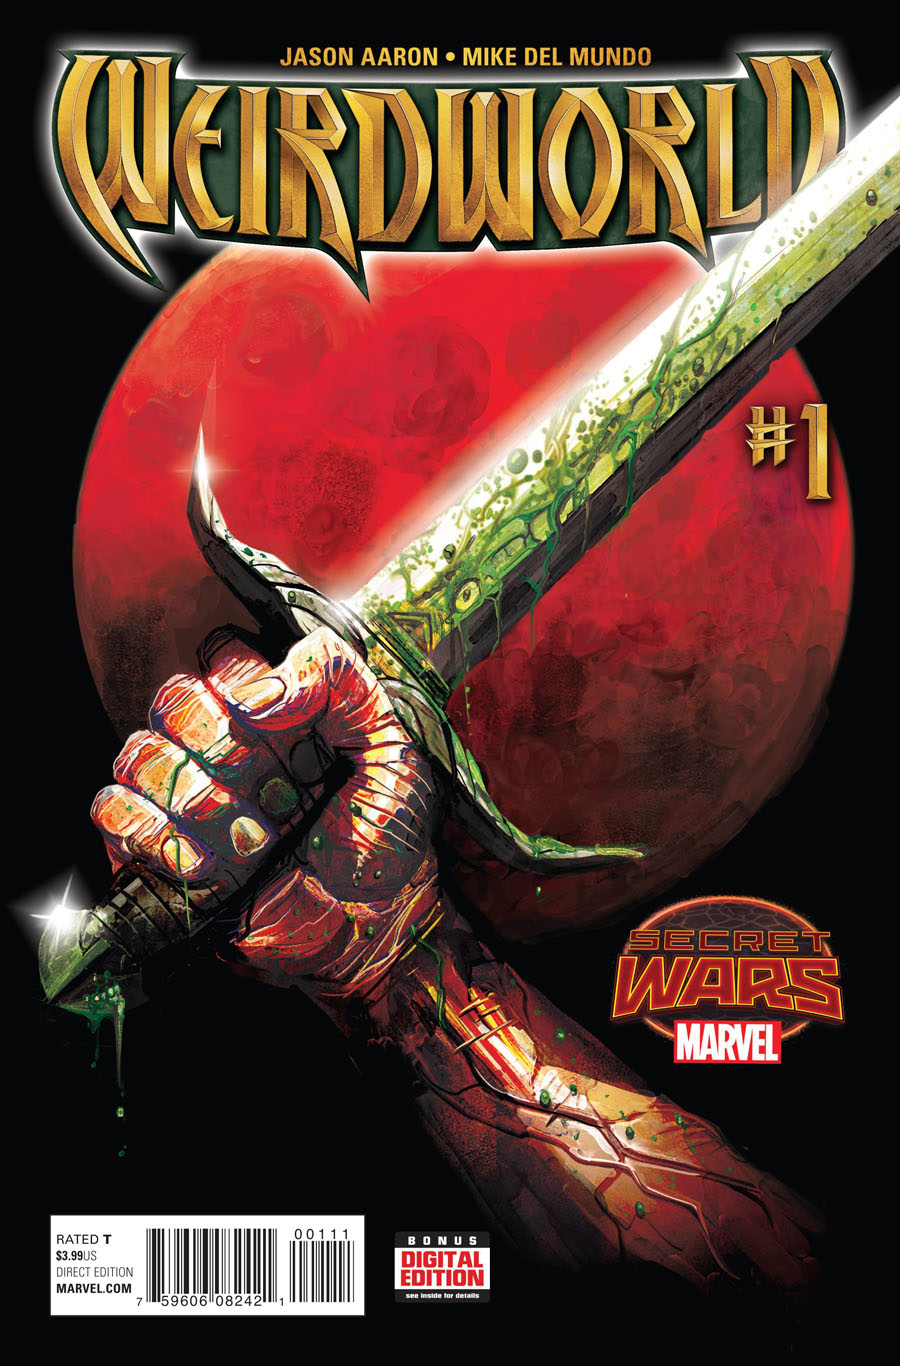 Weirdworld #1 Cover A Regular Michael Del Mundo Cover (Secret Wars Warzones Tie-In)